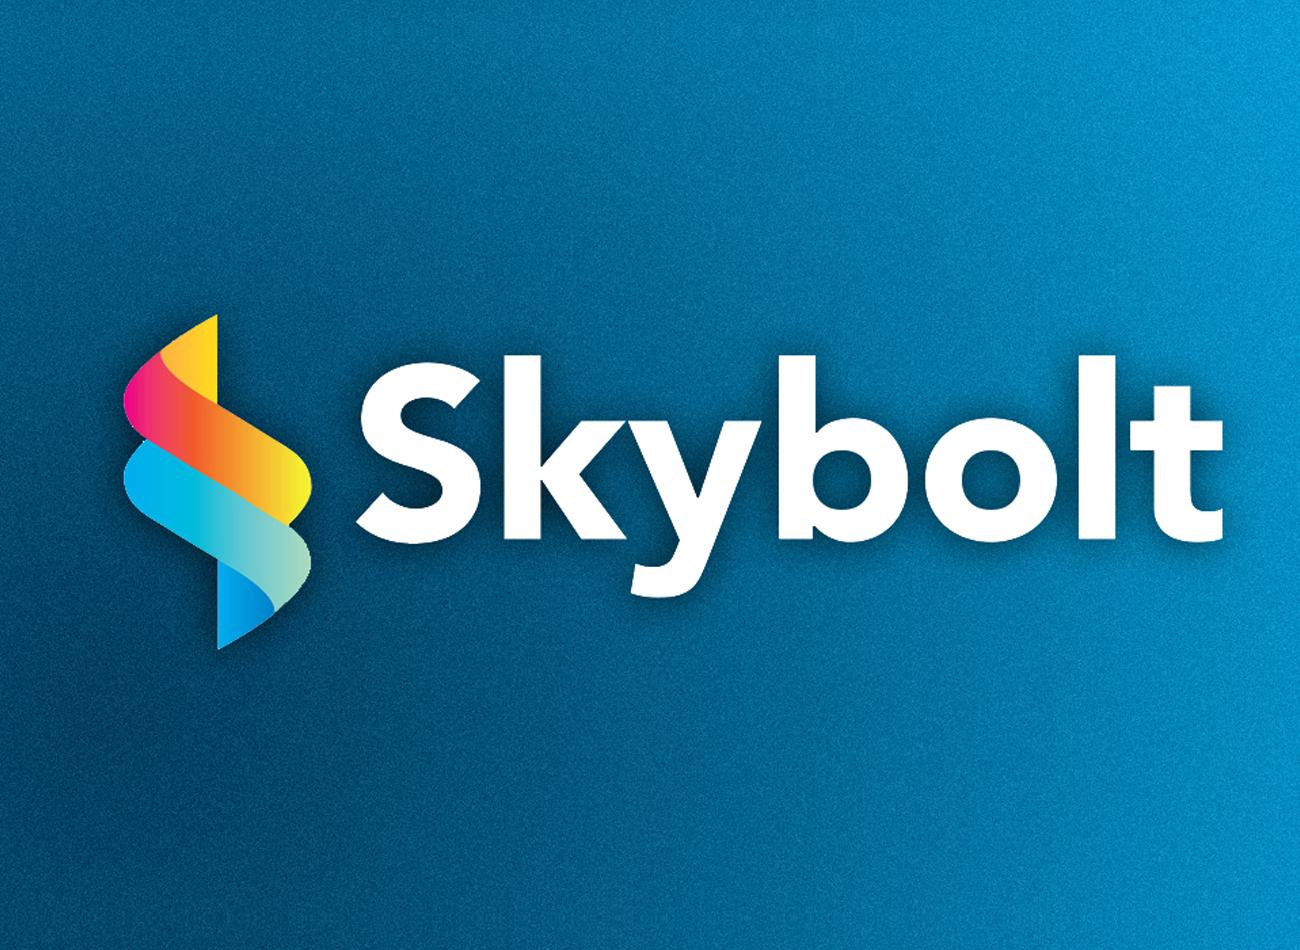 Skybolt-Logo-Case-Study-Corporate-Identity-Agent-Orange-Design-Thumbnail.jpg